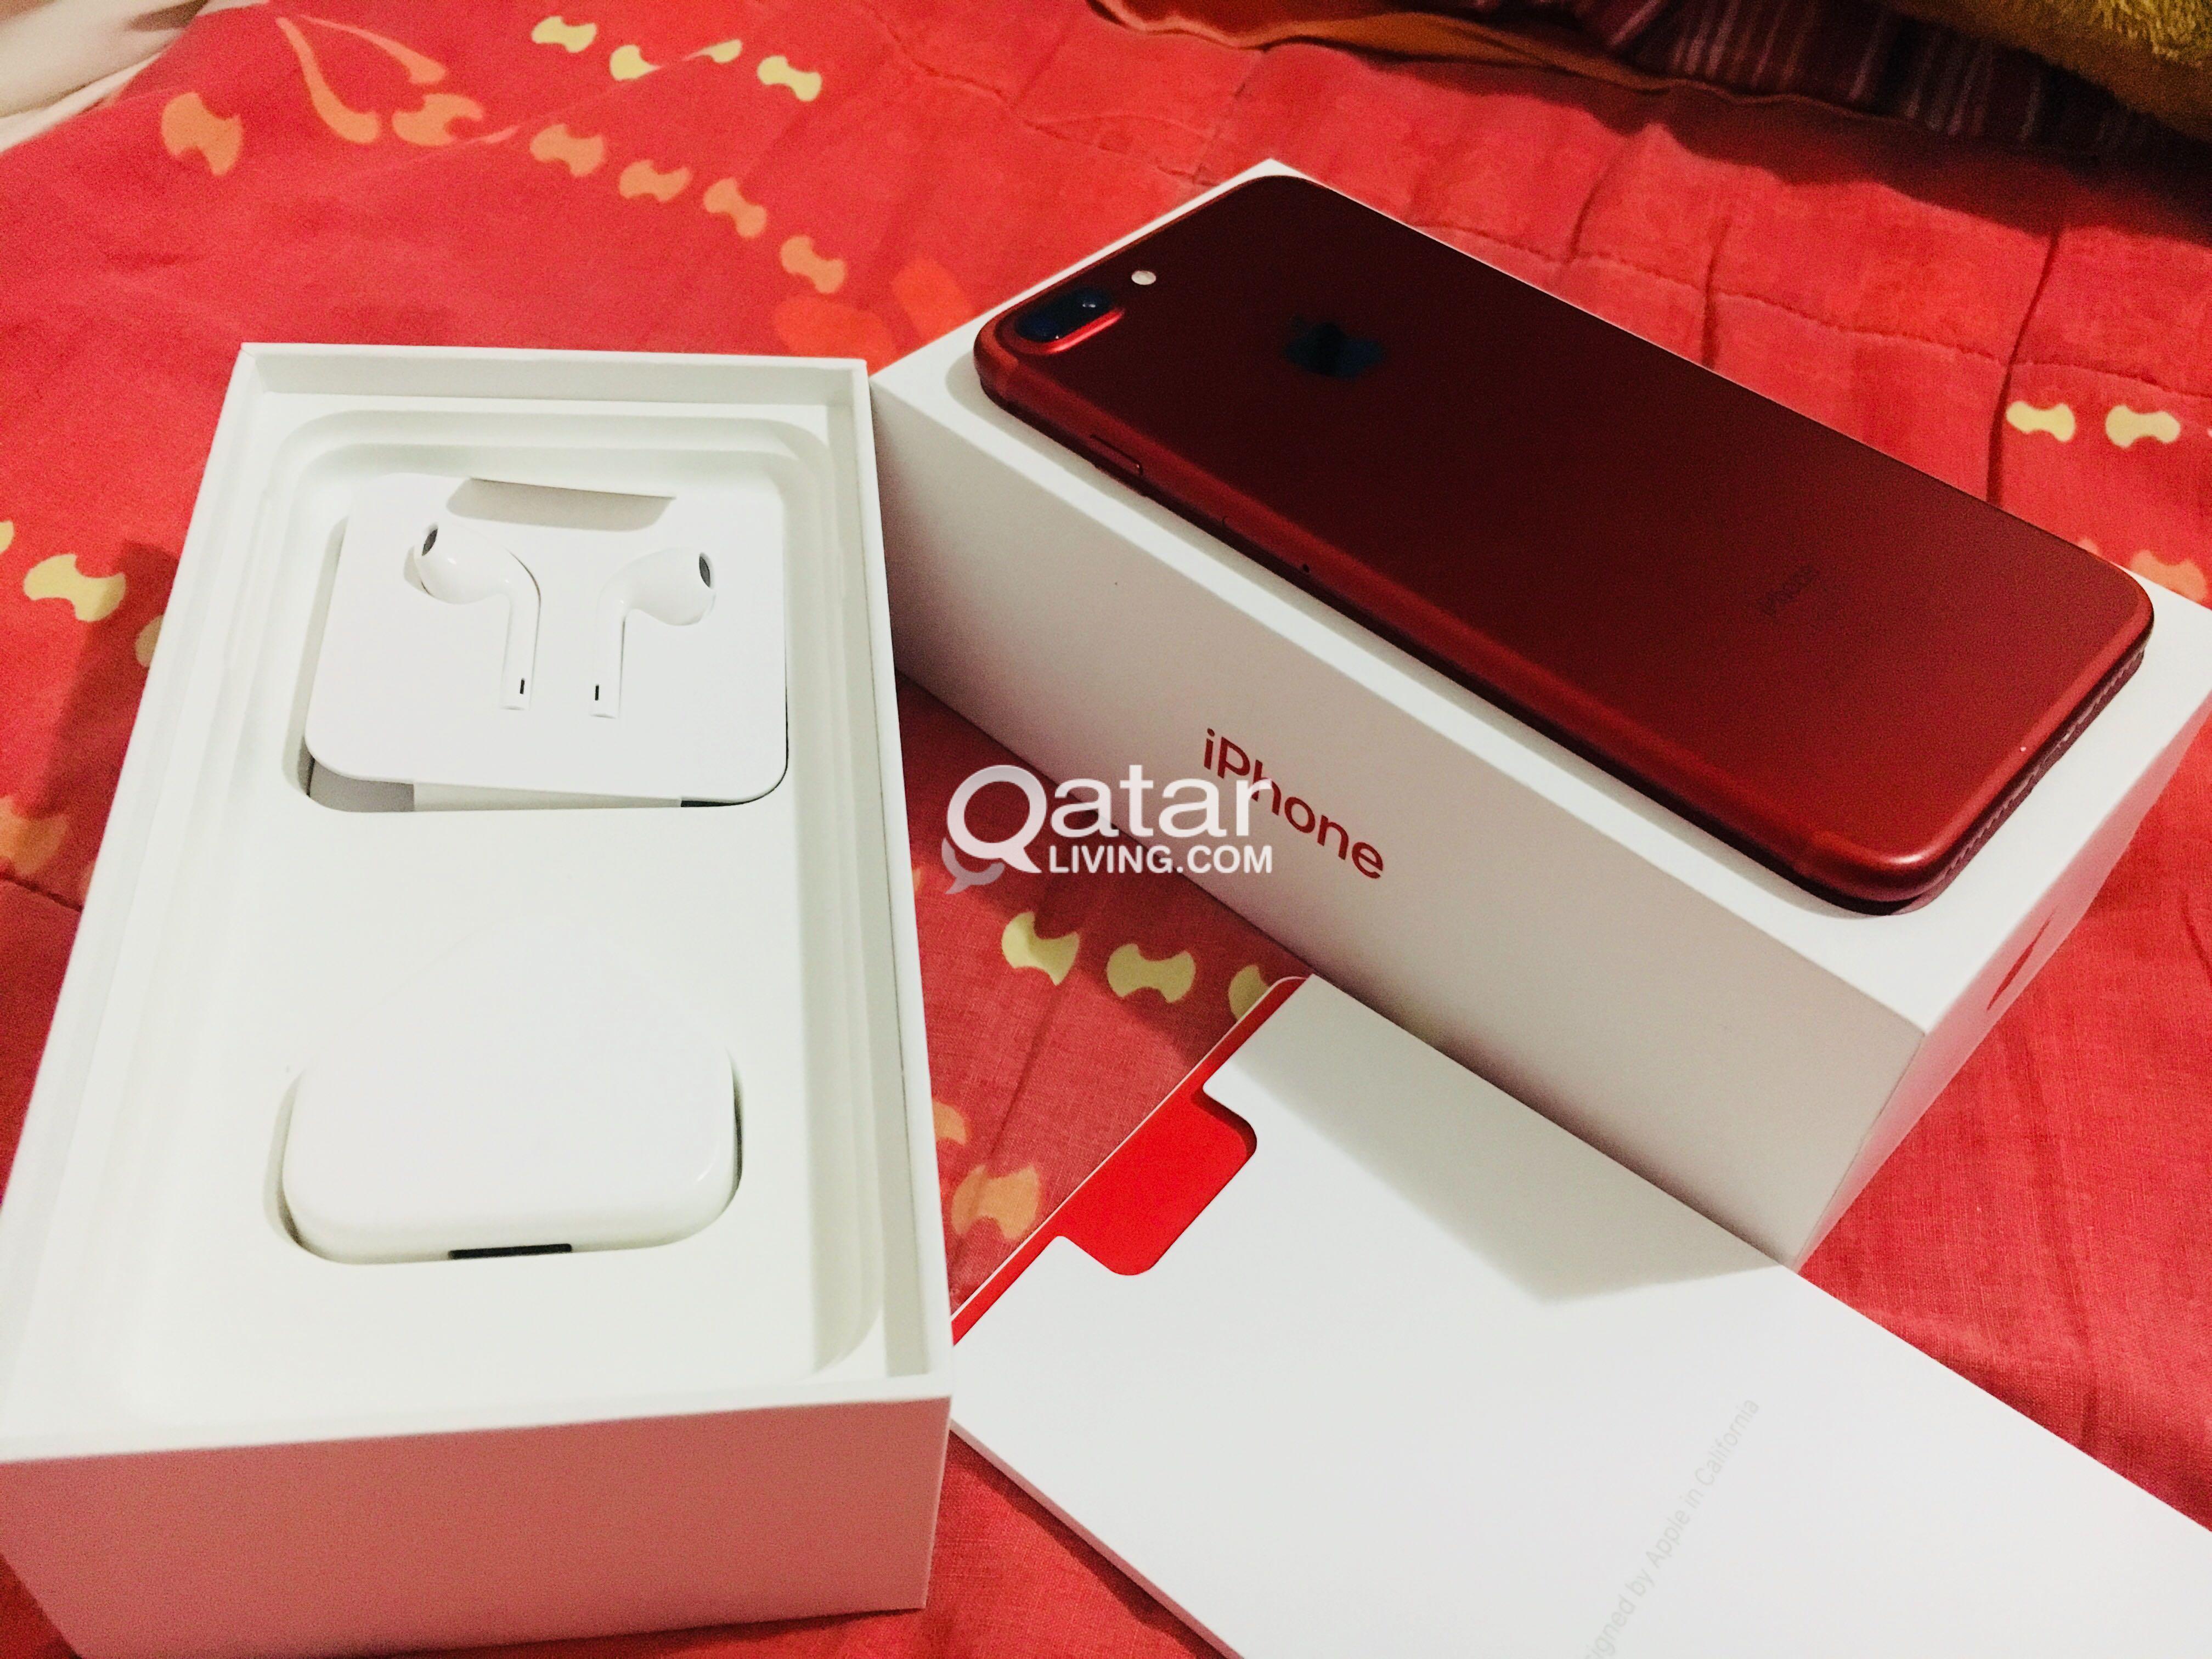 iPhone 7 Plus 128Gb Red New | Qatar Living